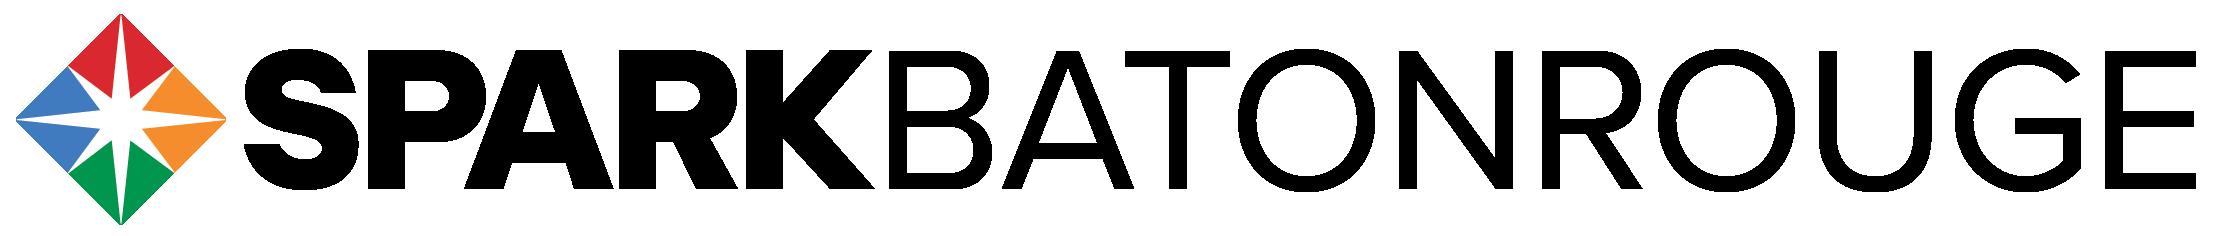 SparkBatonRouge 2021 Fit City Challenge